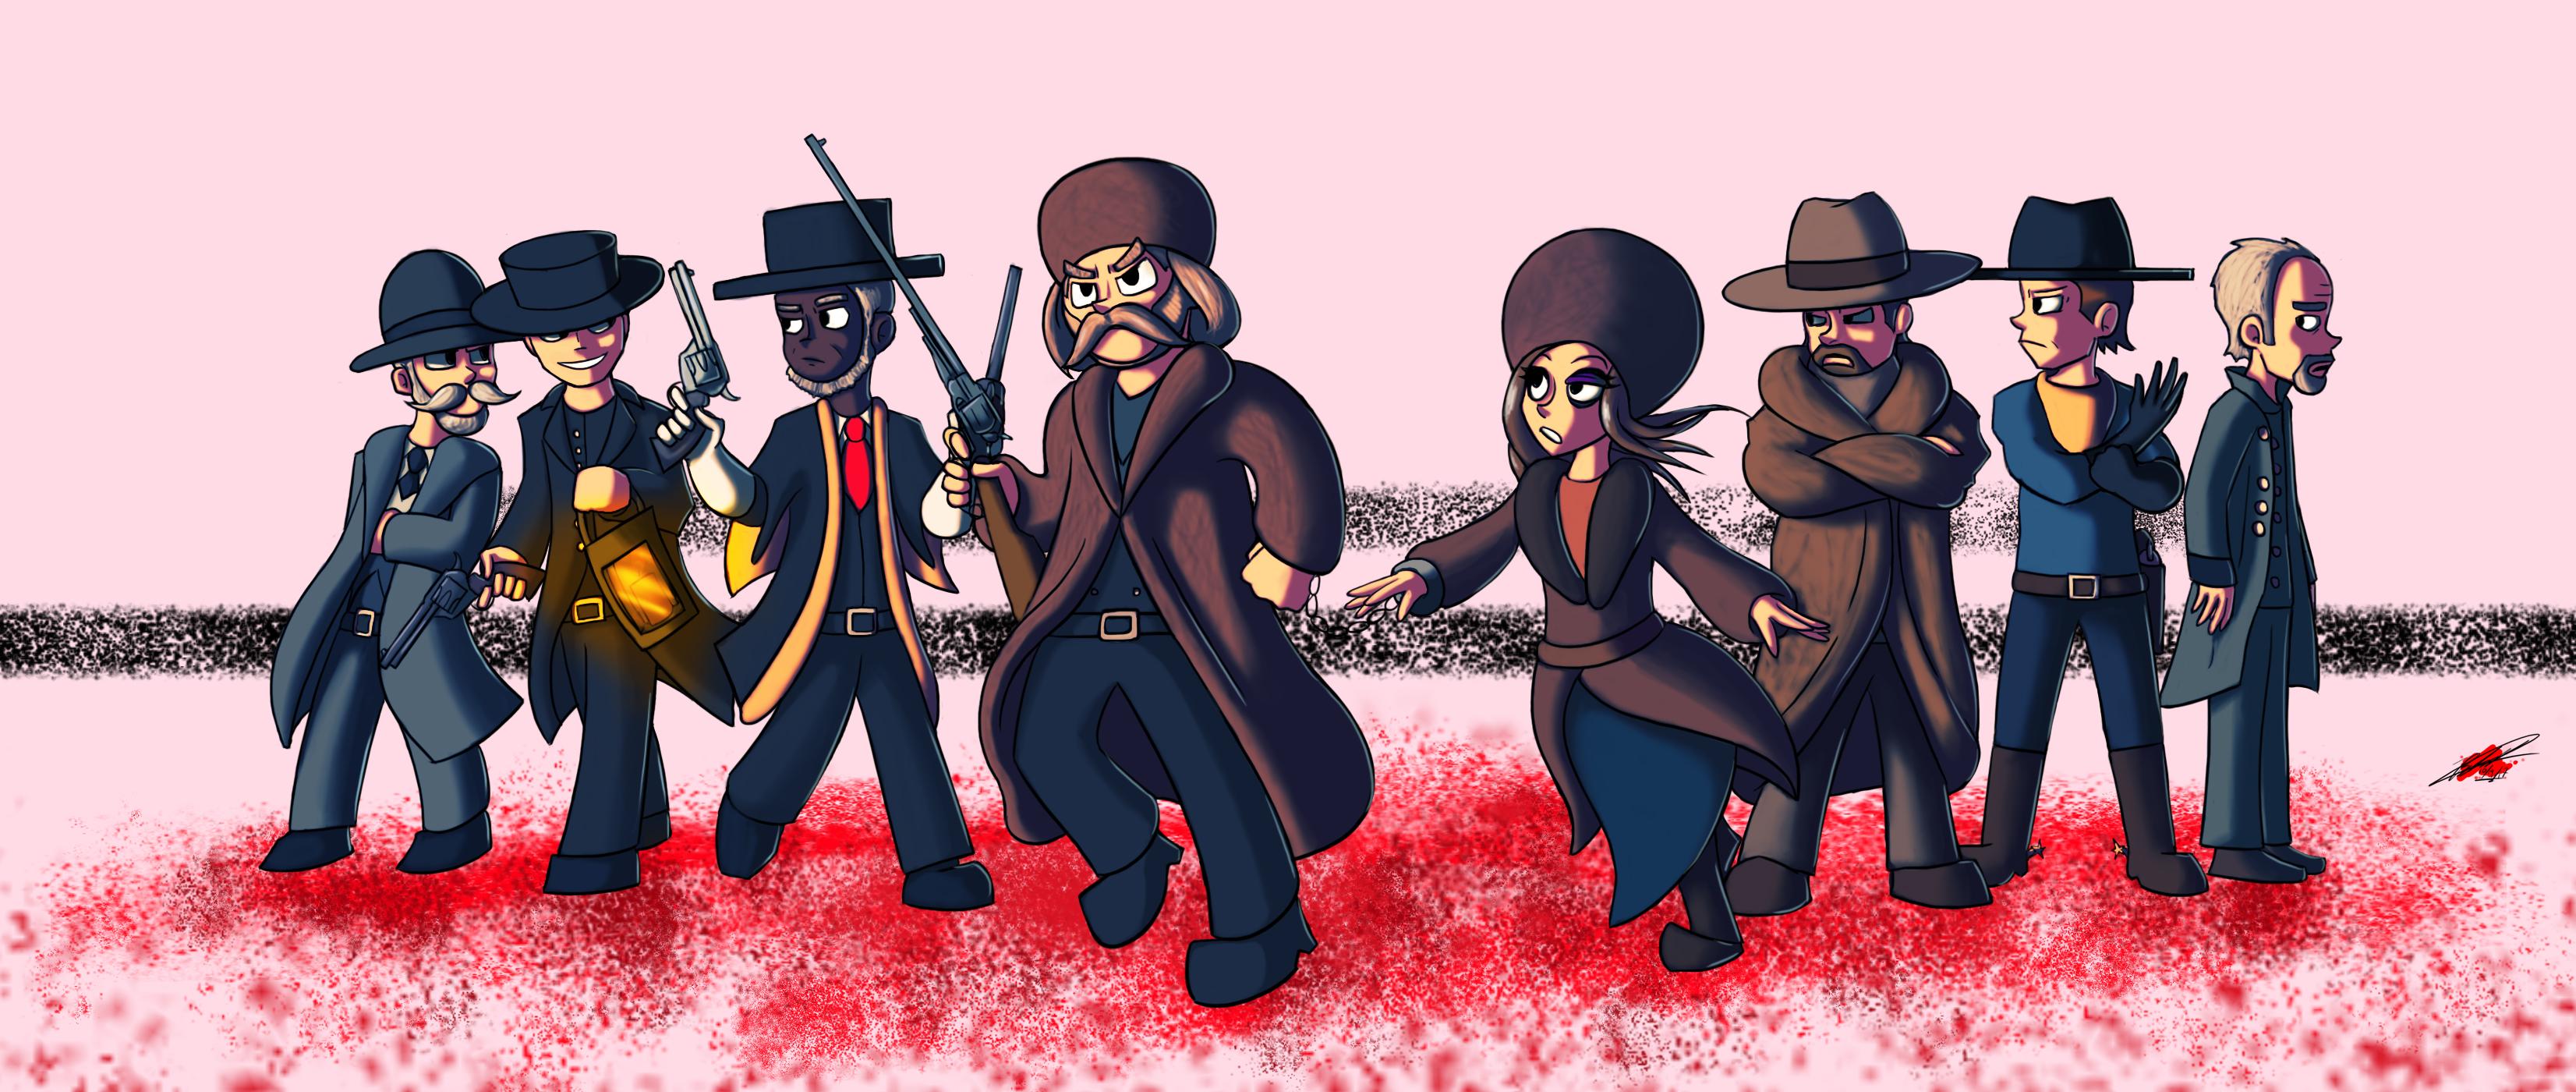 The Hateful Eight Cartoony